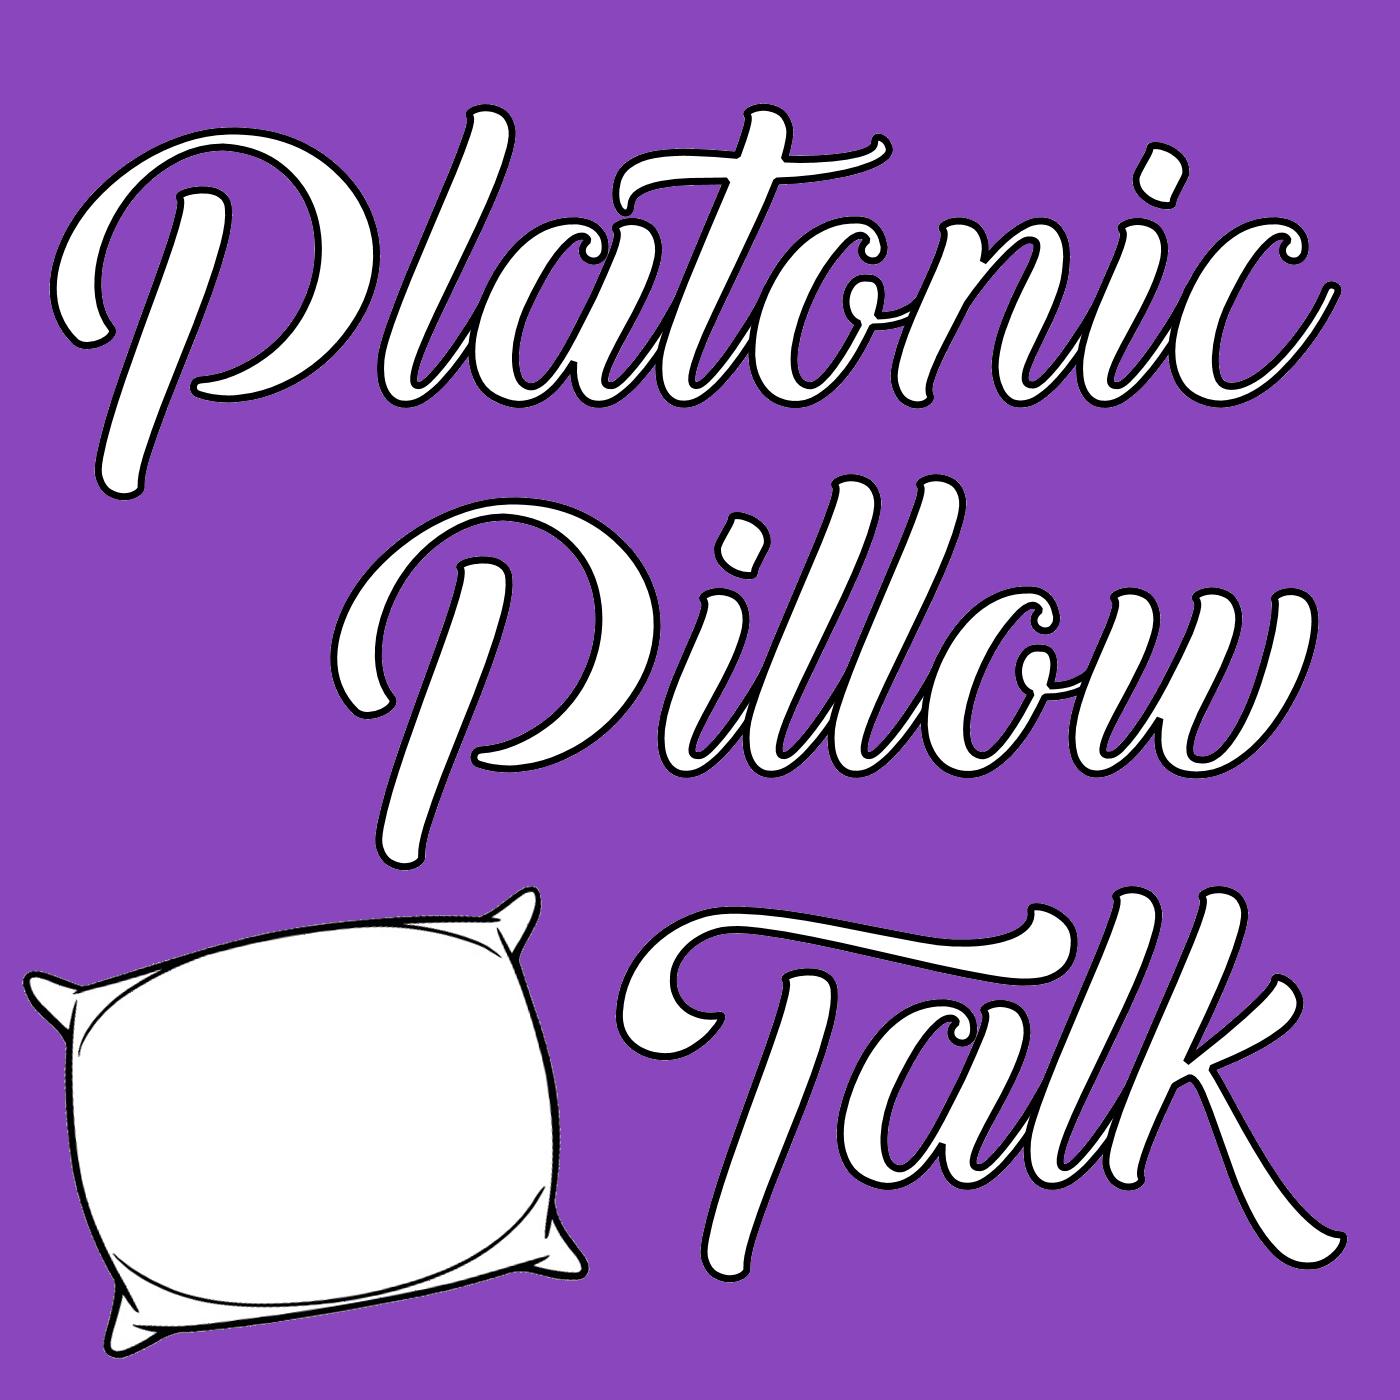 Platonic Pillow Talk